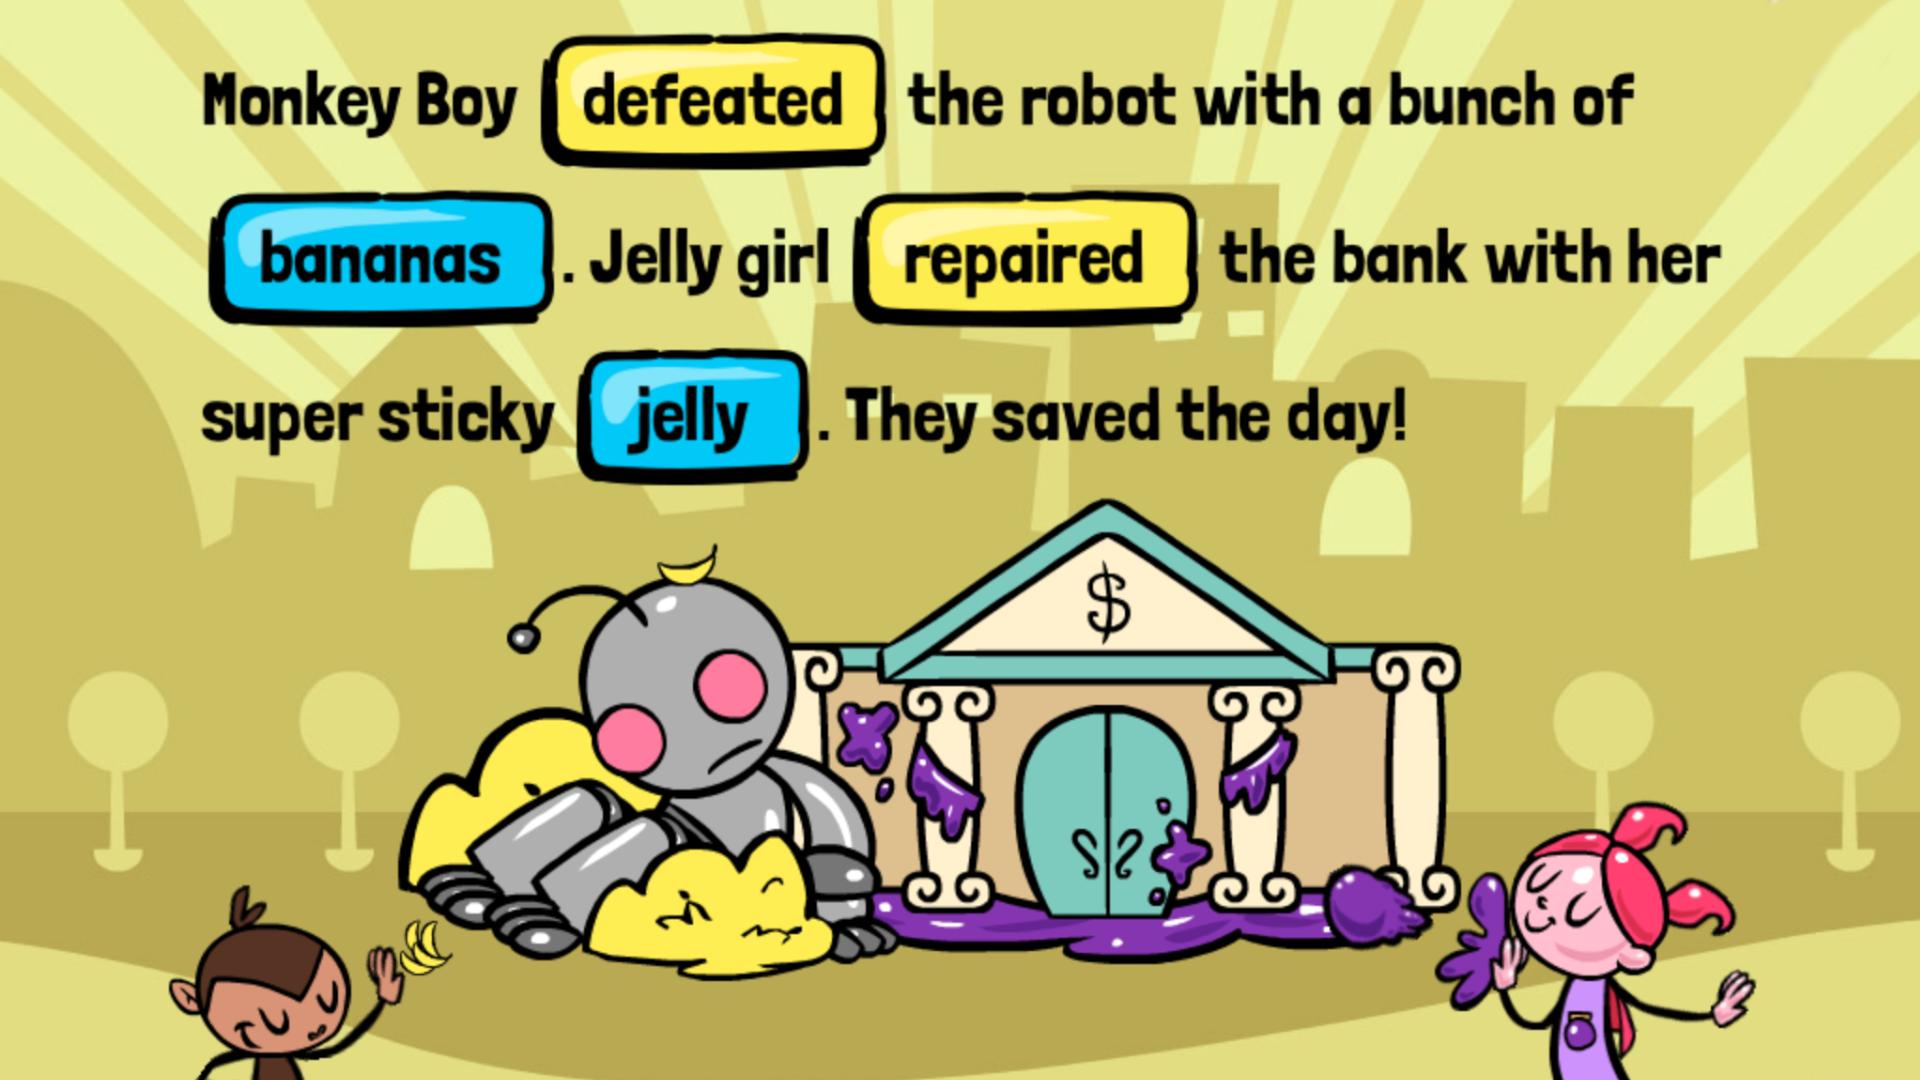 Read Across America Book List - Robot vs Bananas